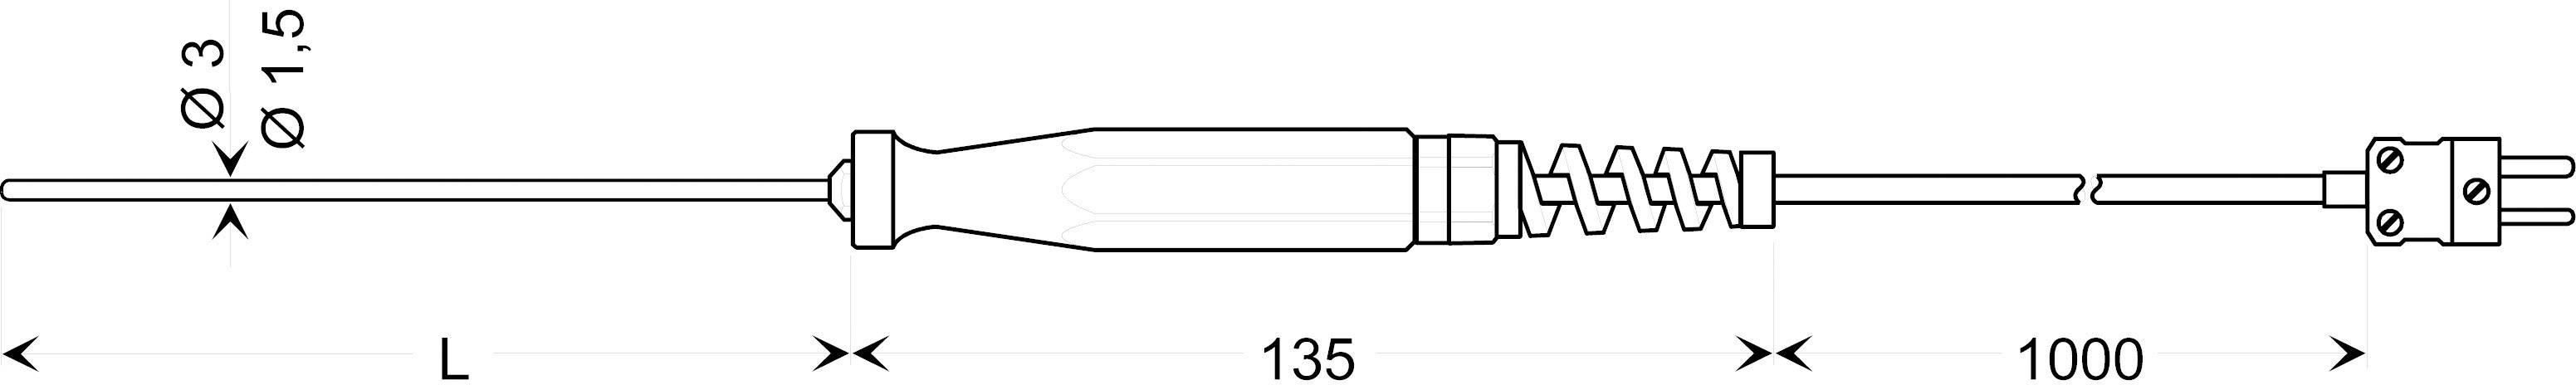 Teplotné čidlo Greisinger GTF 1200, typ K, -200 až +1150 °C